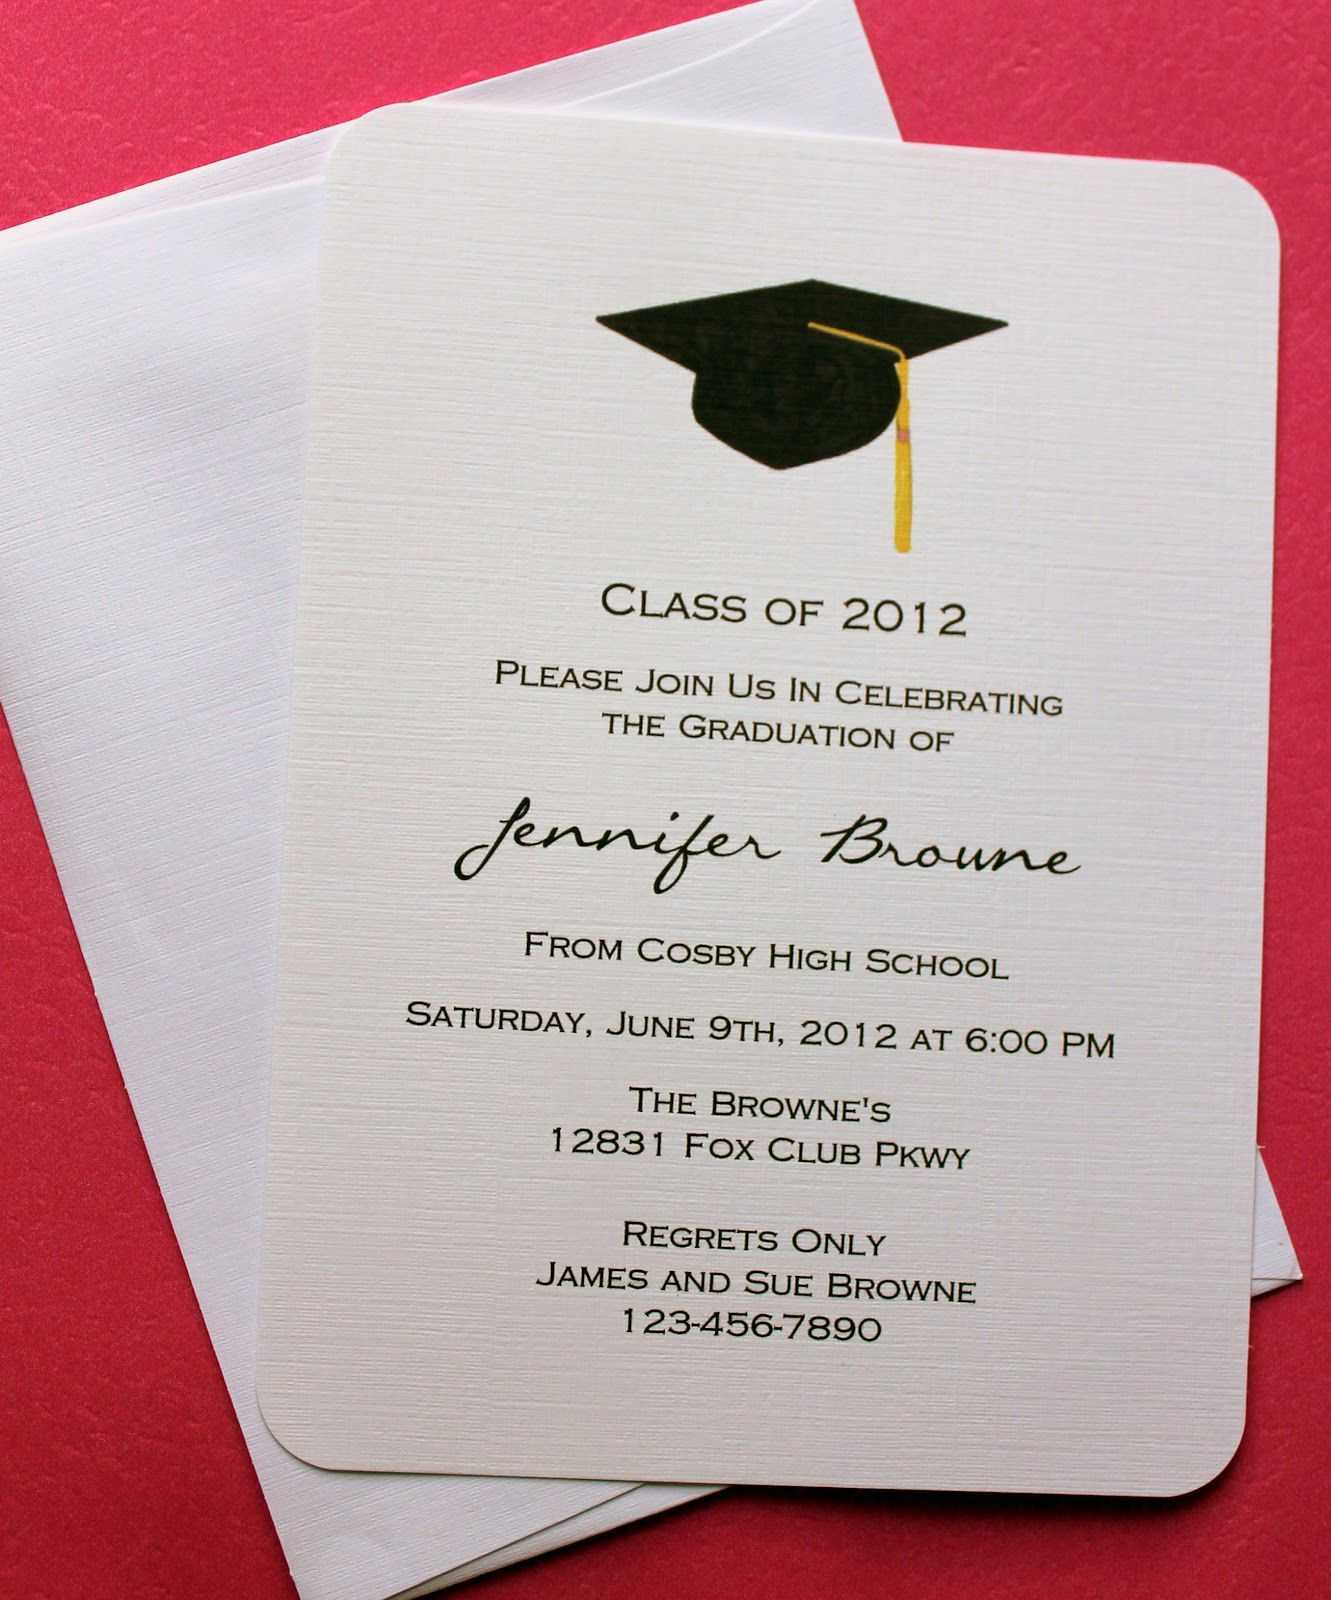 Graduation Invitation Templates Microsoft Word | Graduation Intended For Graduation Invitation Templates Microsoft Word